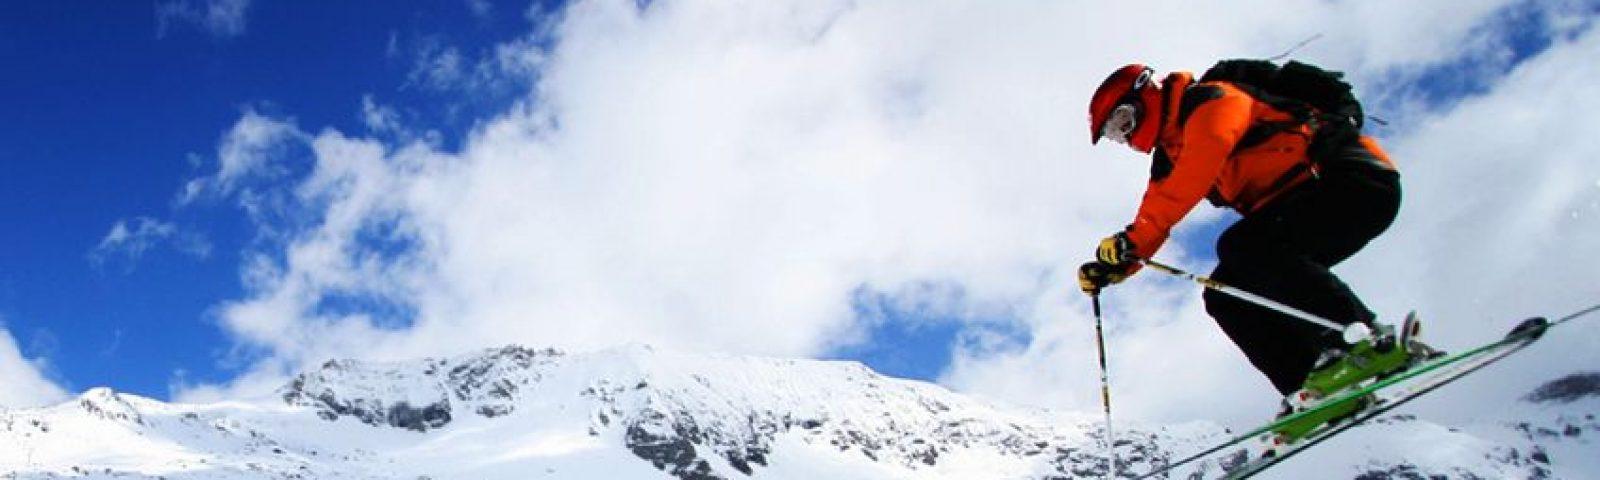 big-sky-montana-skier